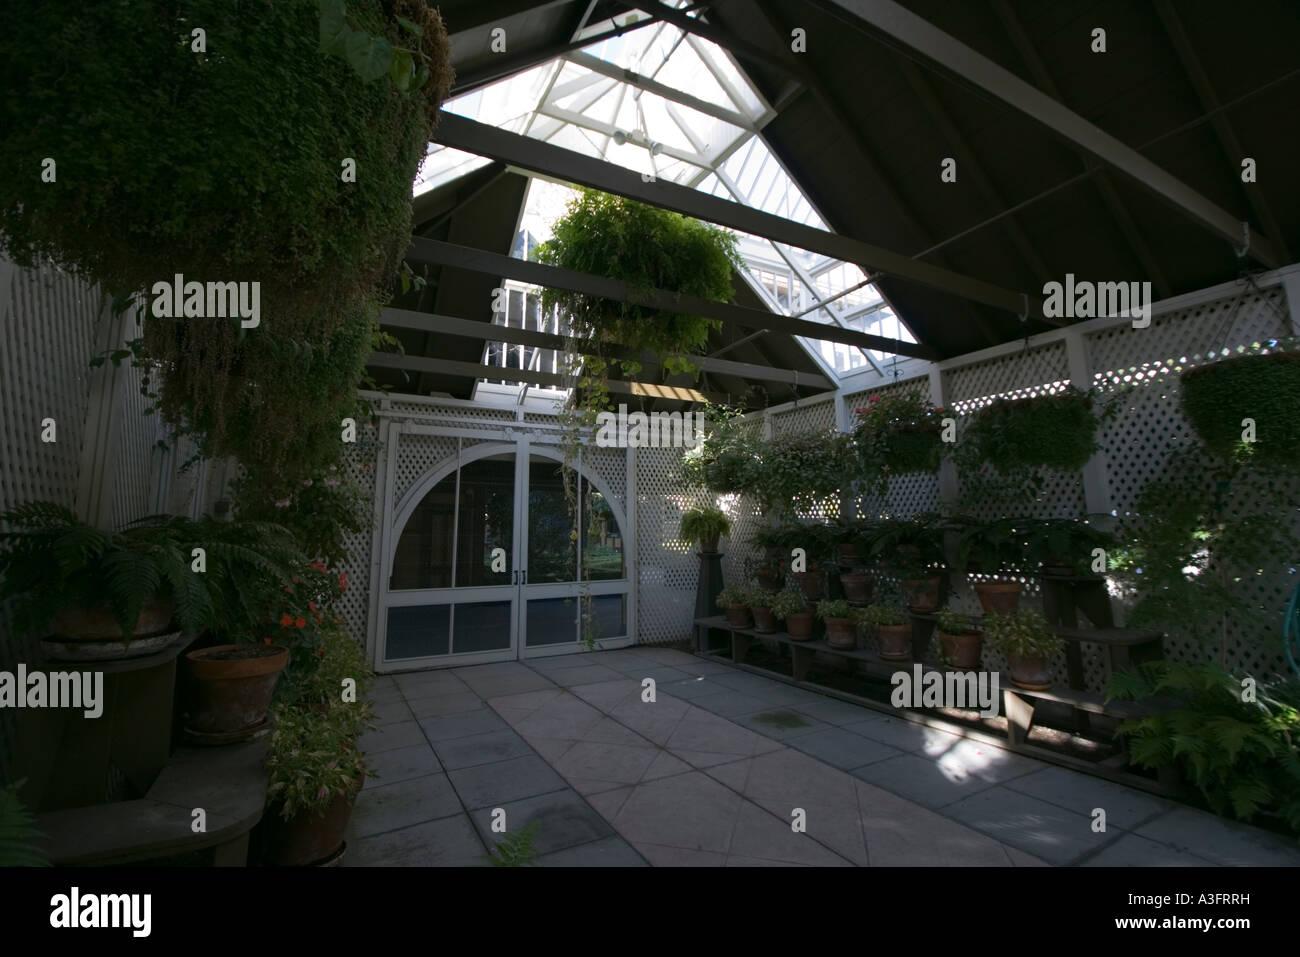 winchester mystery house stock photos u0026 winchester mystery house